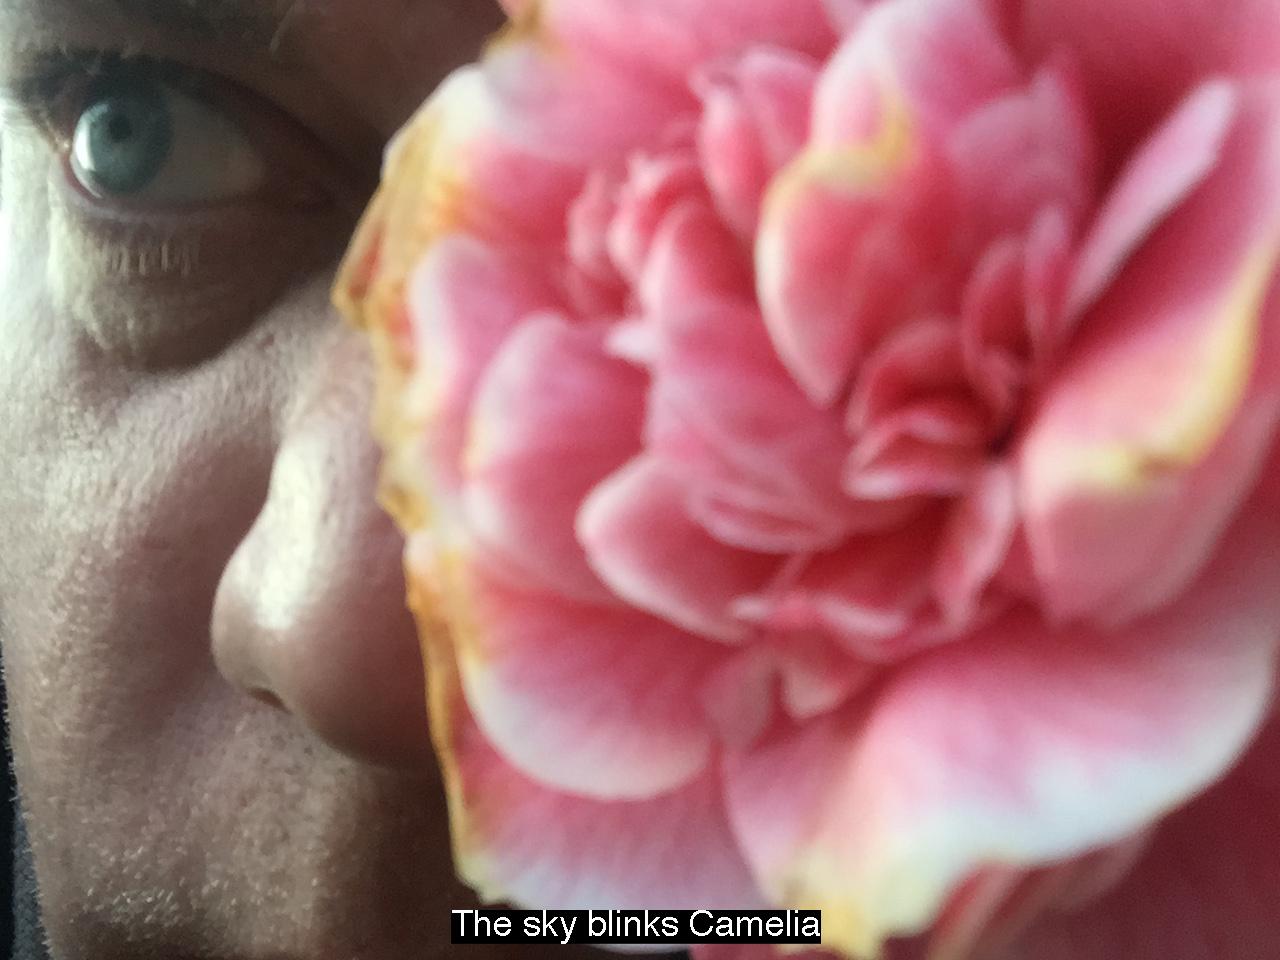 Camelia Eye text